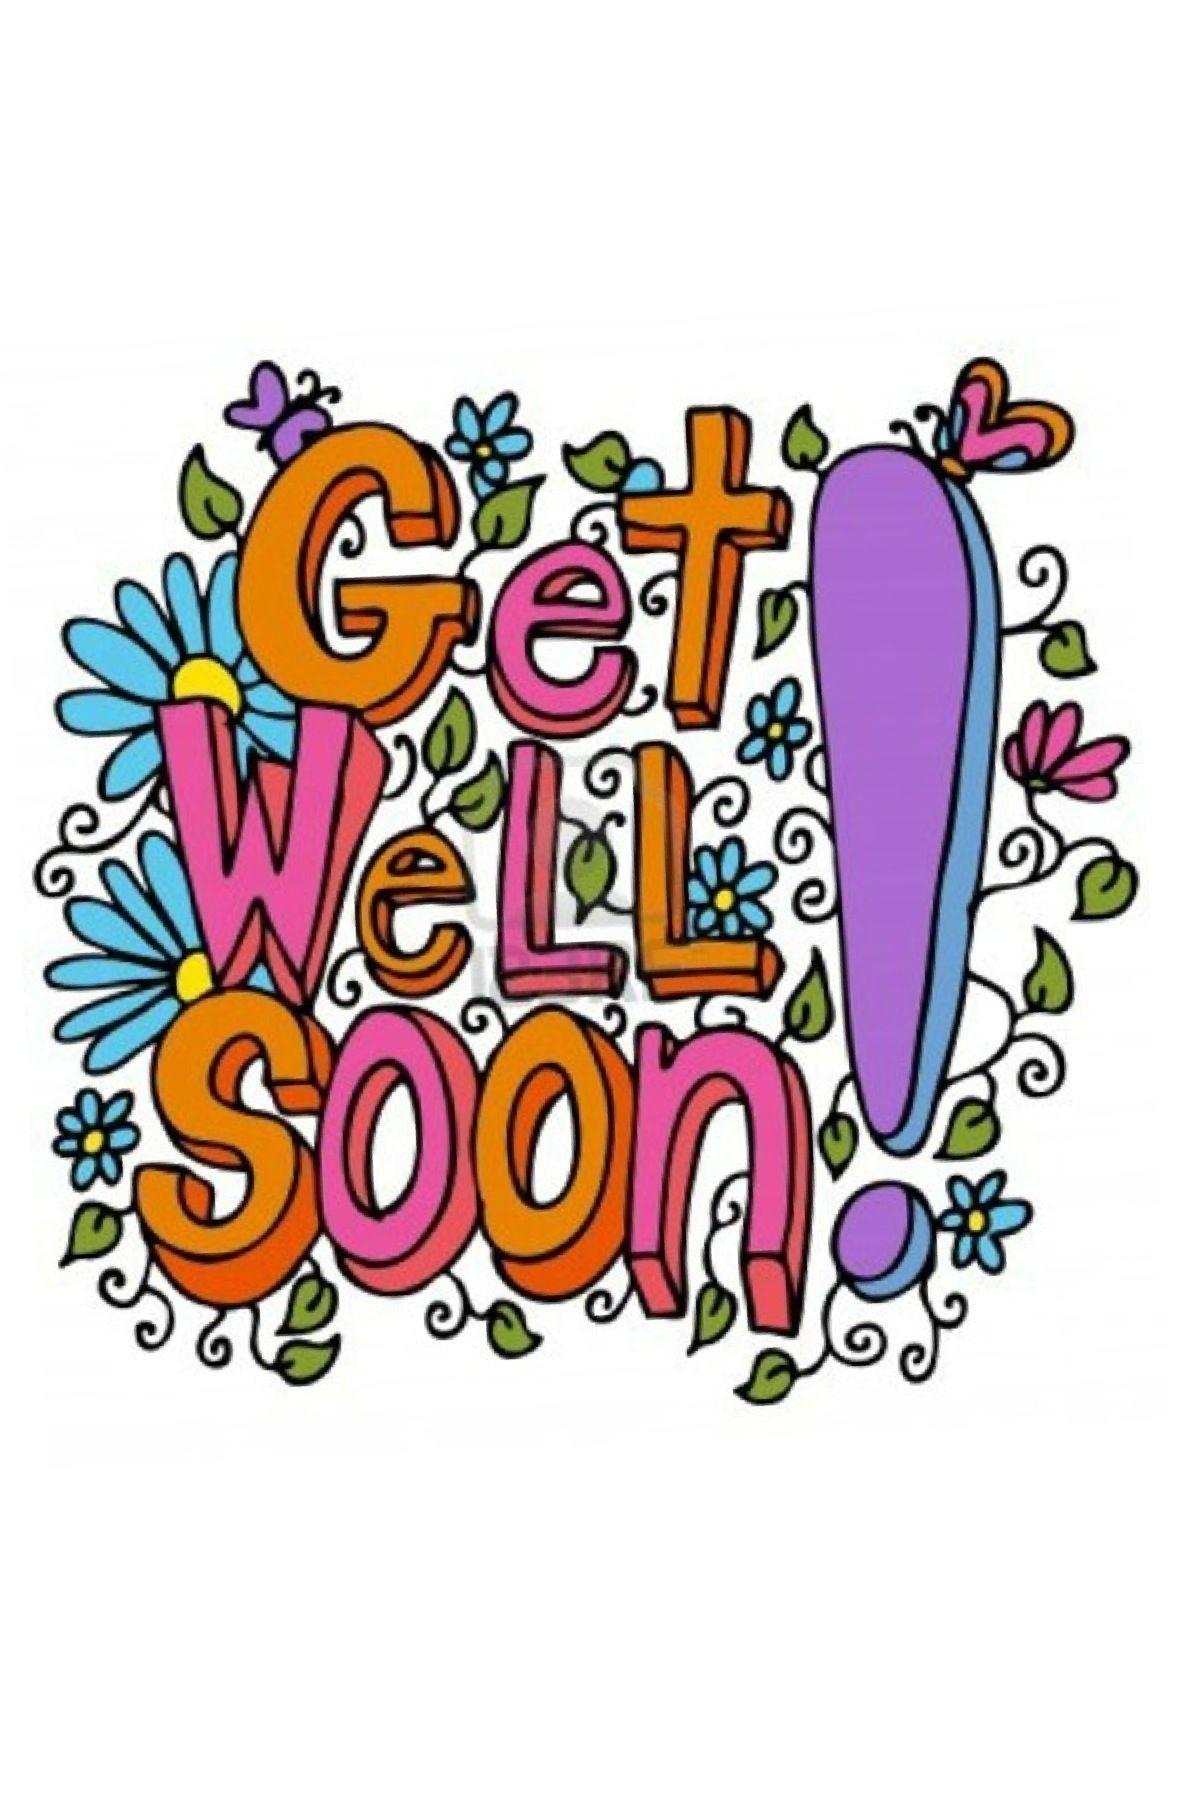 Fullsize Of Get Well Soon Message